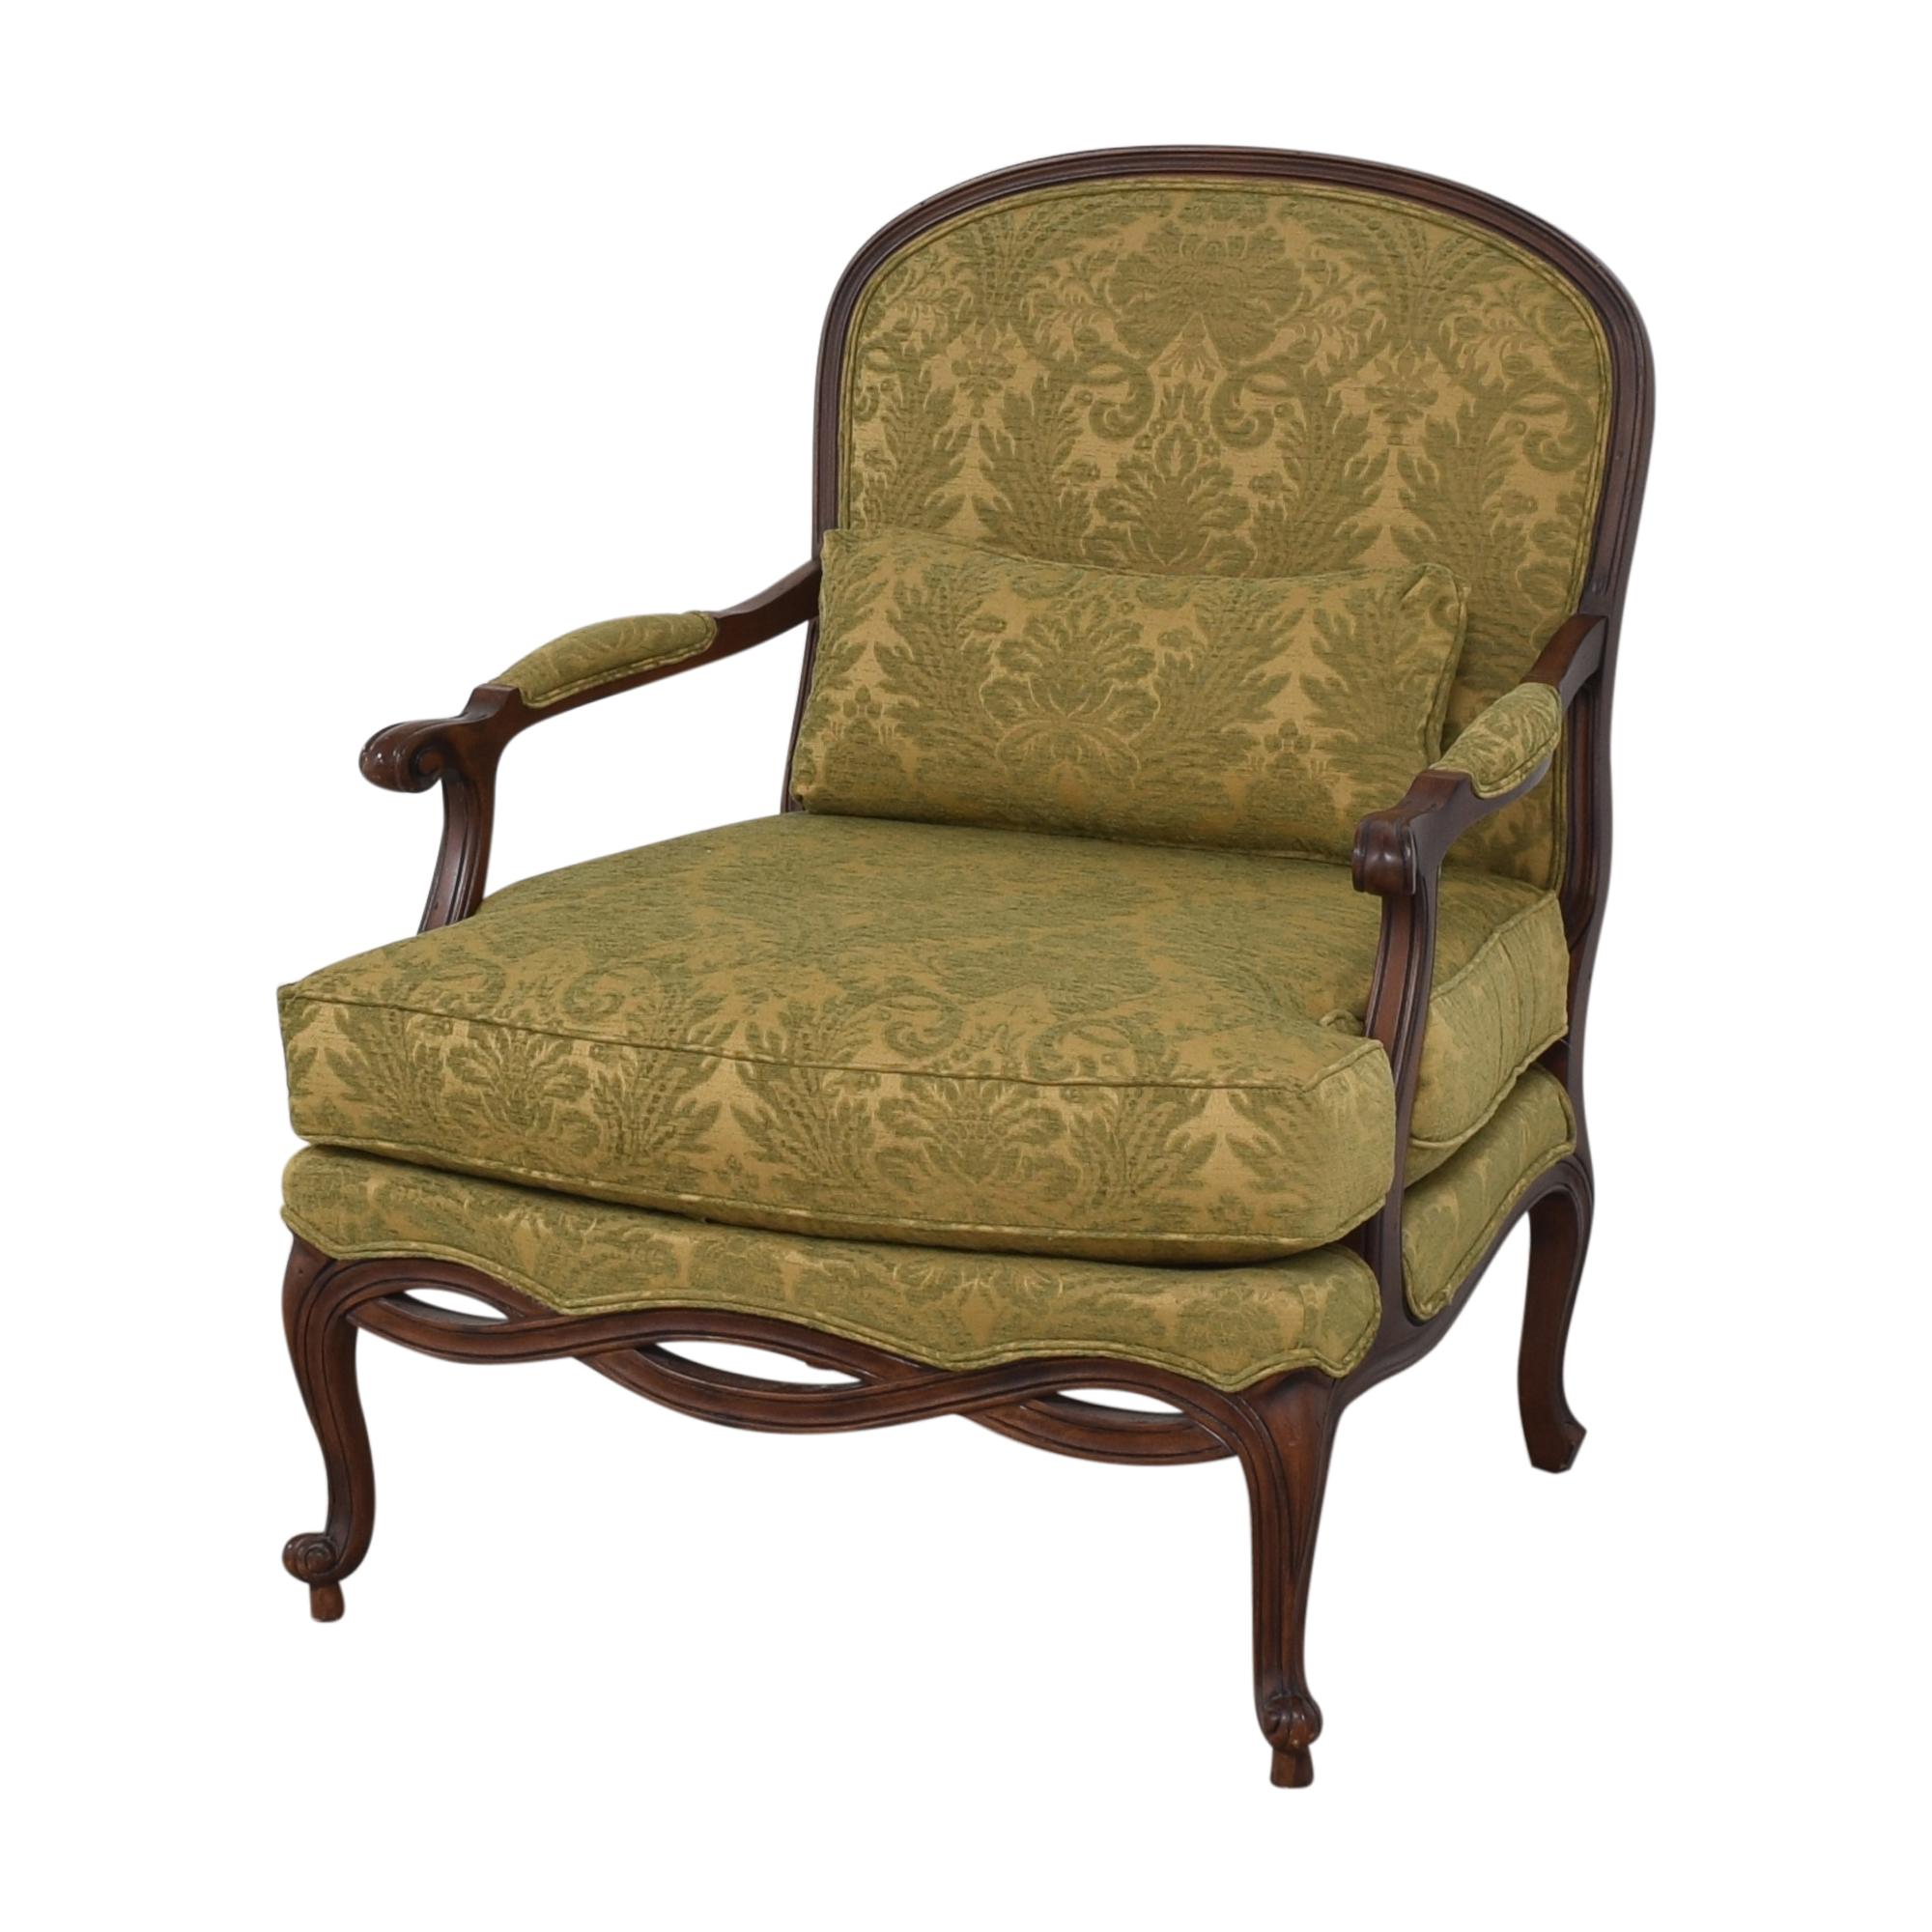 Ethan Allen Ethan Allen Bergere Chair used